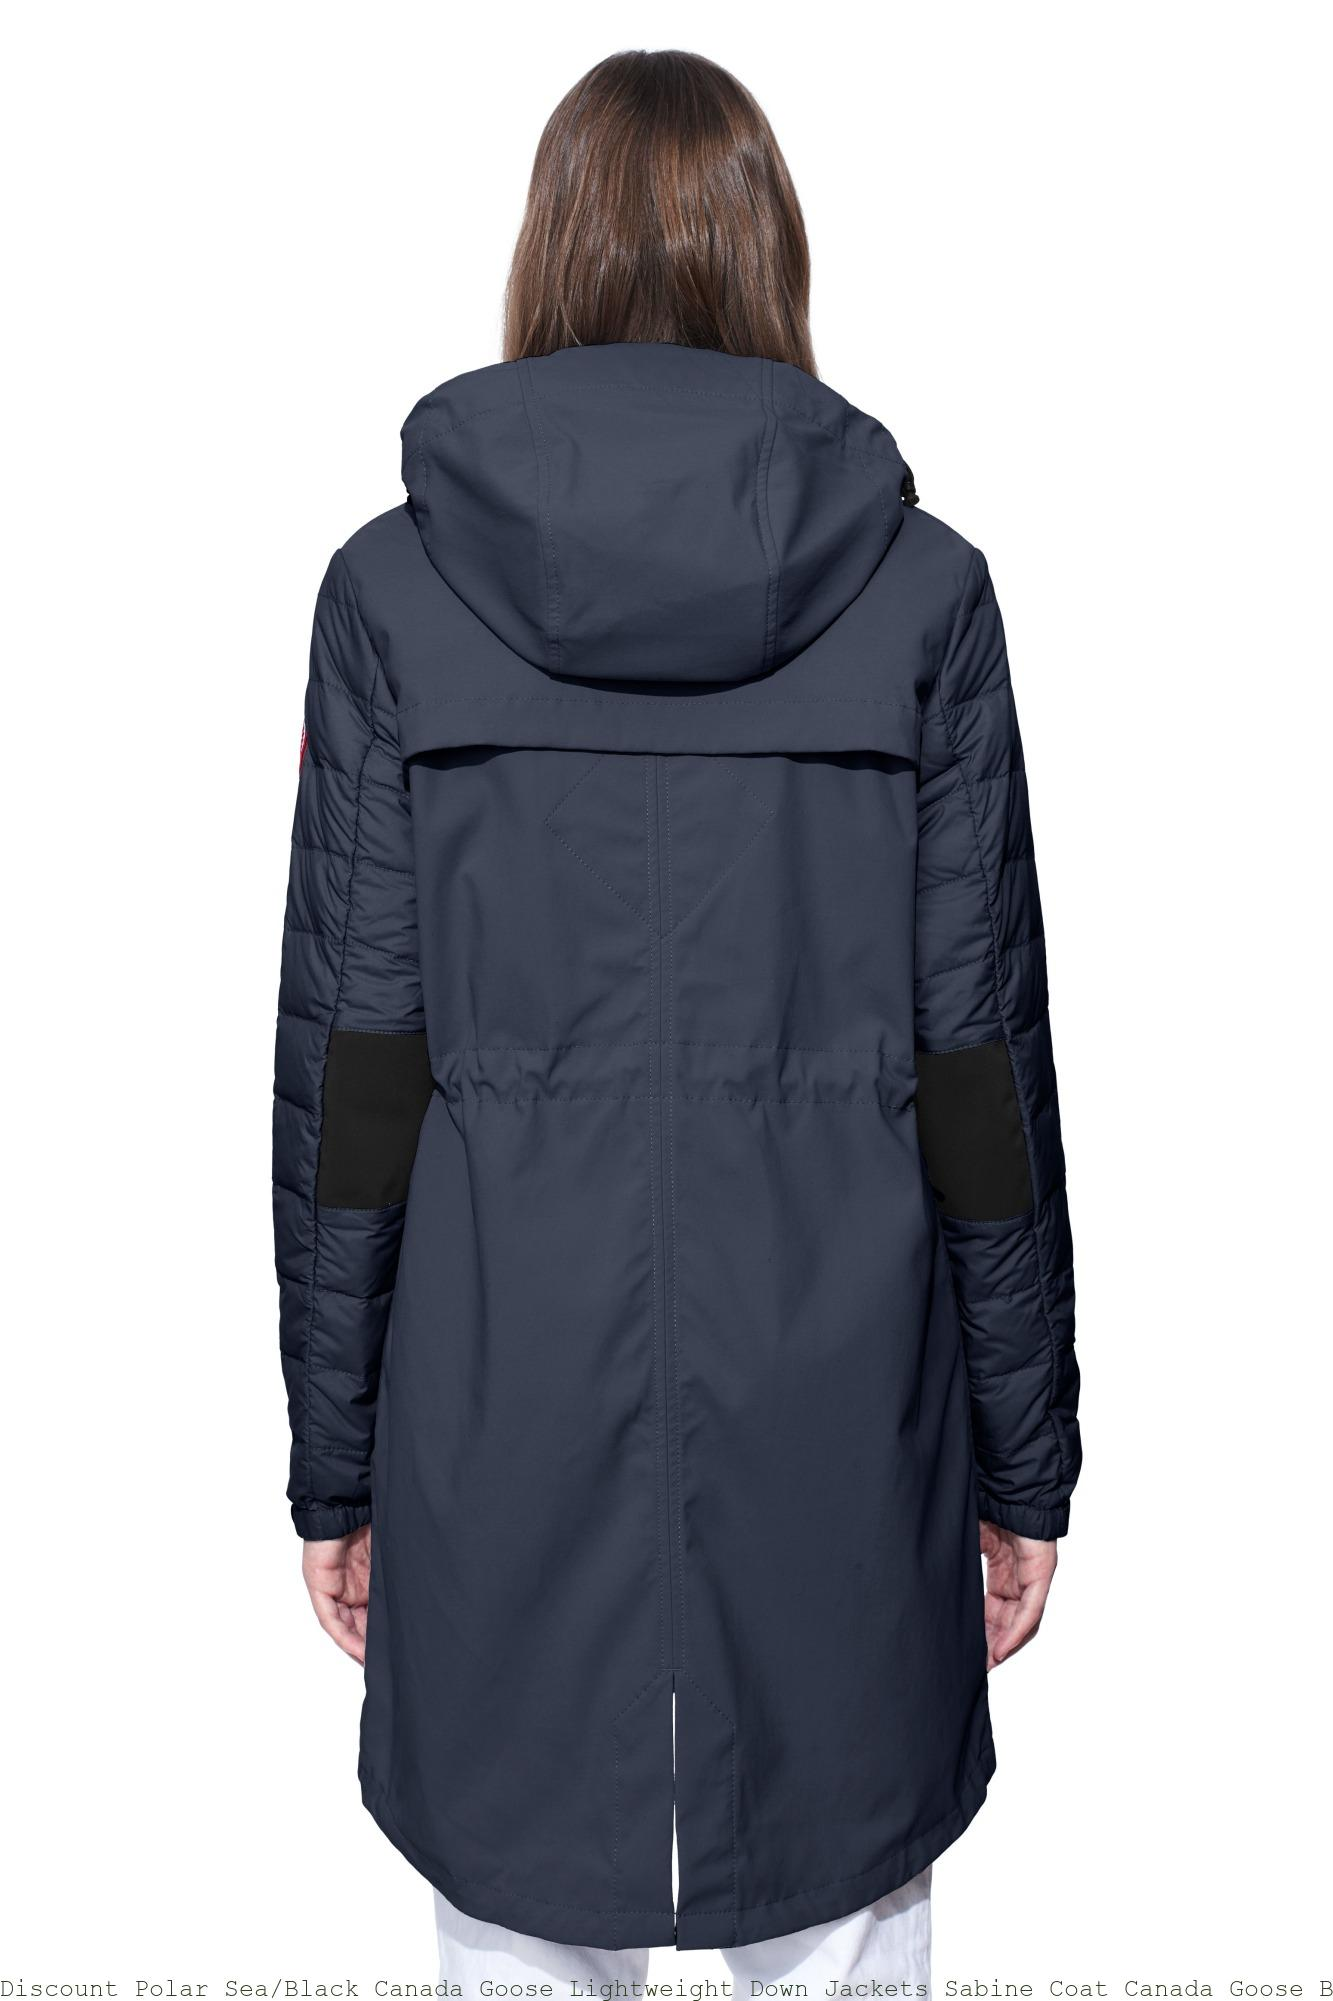 Discount Polar SeaBlack Canada Goose Lightweight Down Jackets Sabine Coat Canada Goose Black Friday Sale 2902LZ